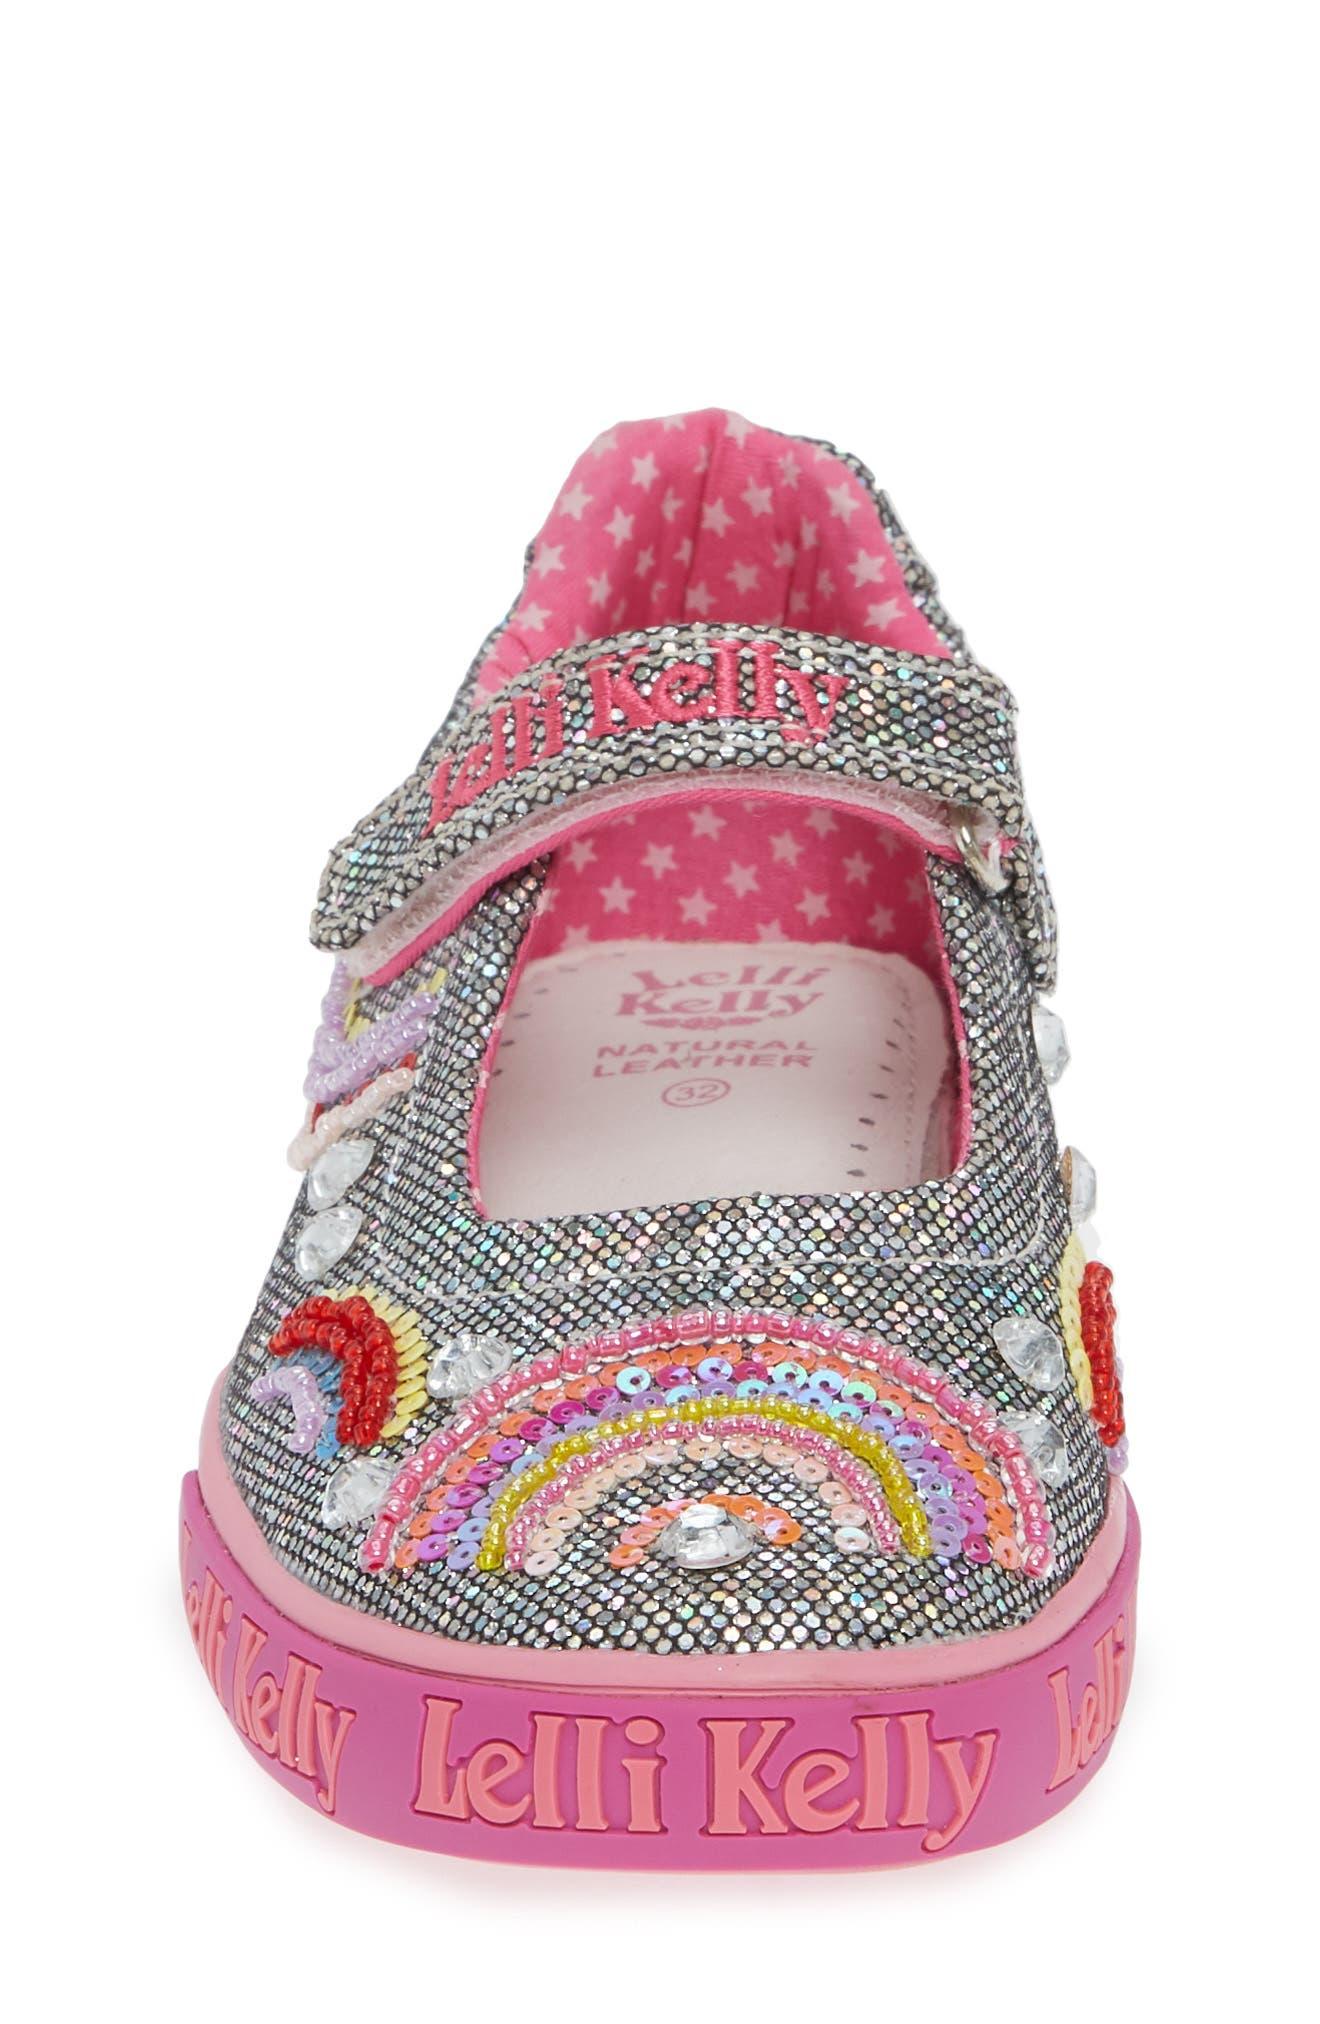 LELLI KELLY, Beaded Rainbow Mary Jane Sneaker, Alternate thumbnail 4, color, PEWTER